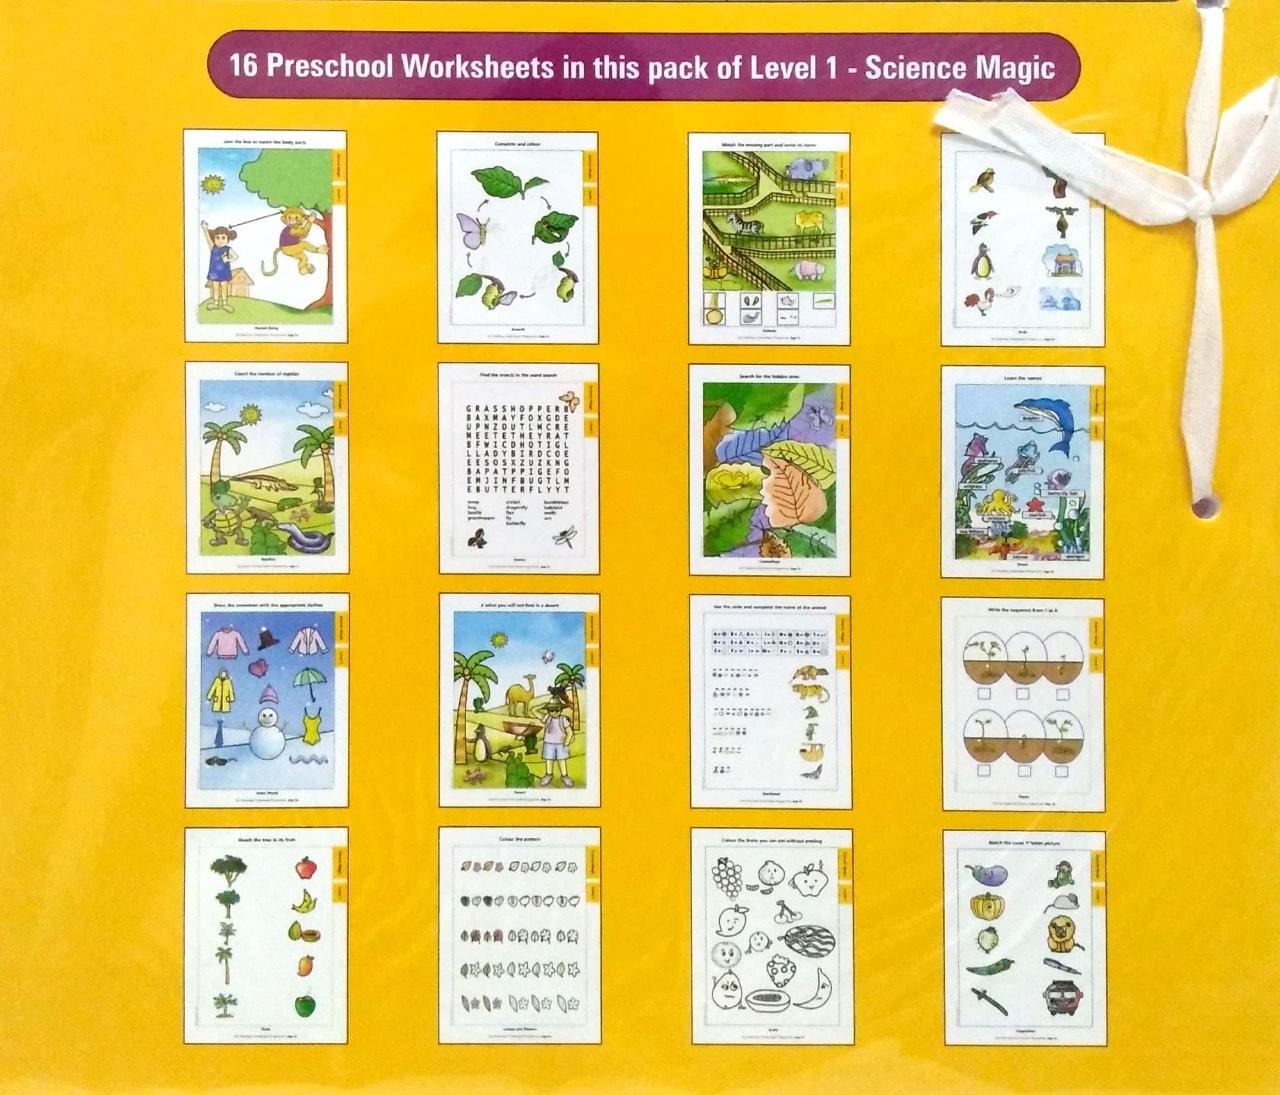 My Preschool Worksheets Science Magic Level 1 (Age3+)